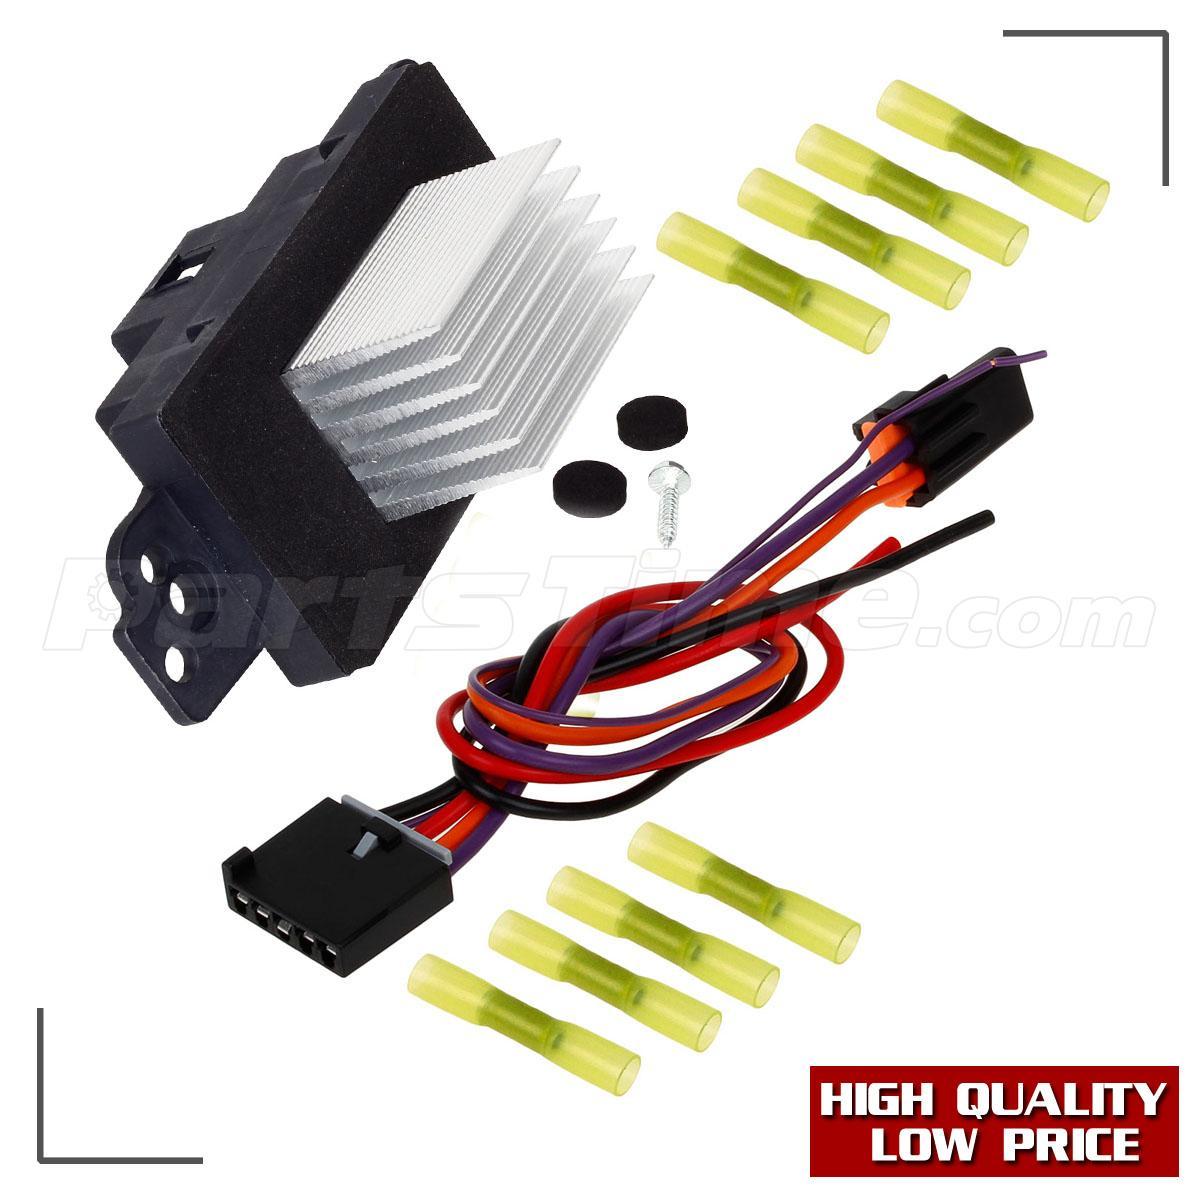 Chevy Impala Blower Motor Resistor: Blower Motor Resistor For 05-09 BUICK LACROSSE 04-13